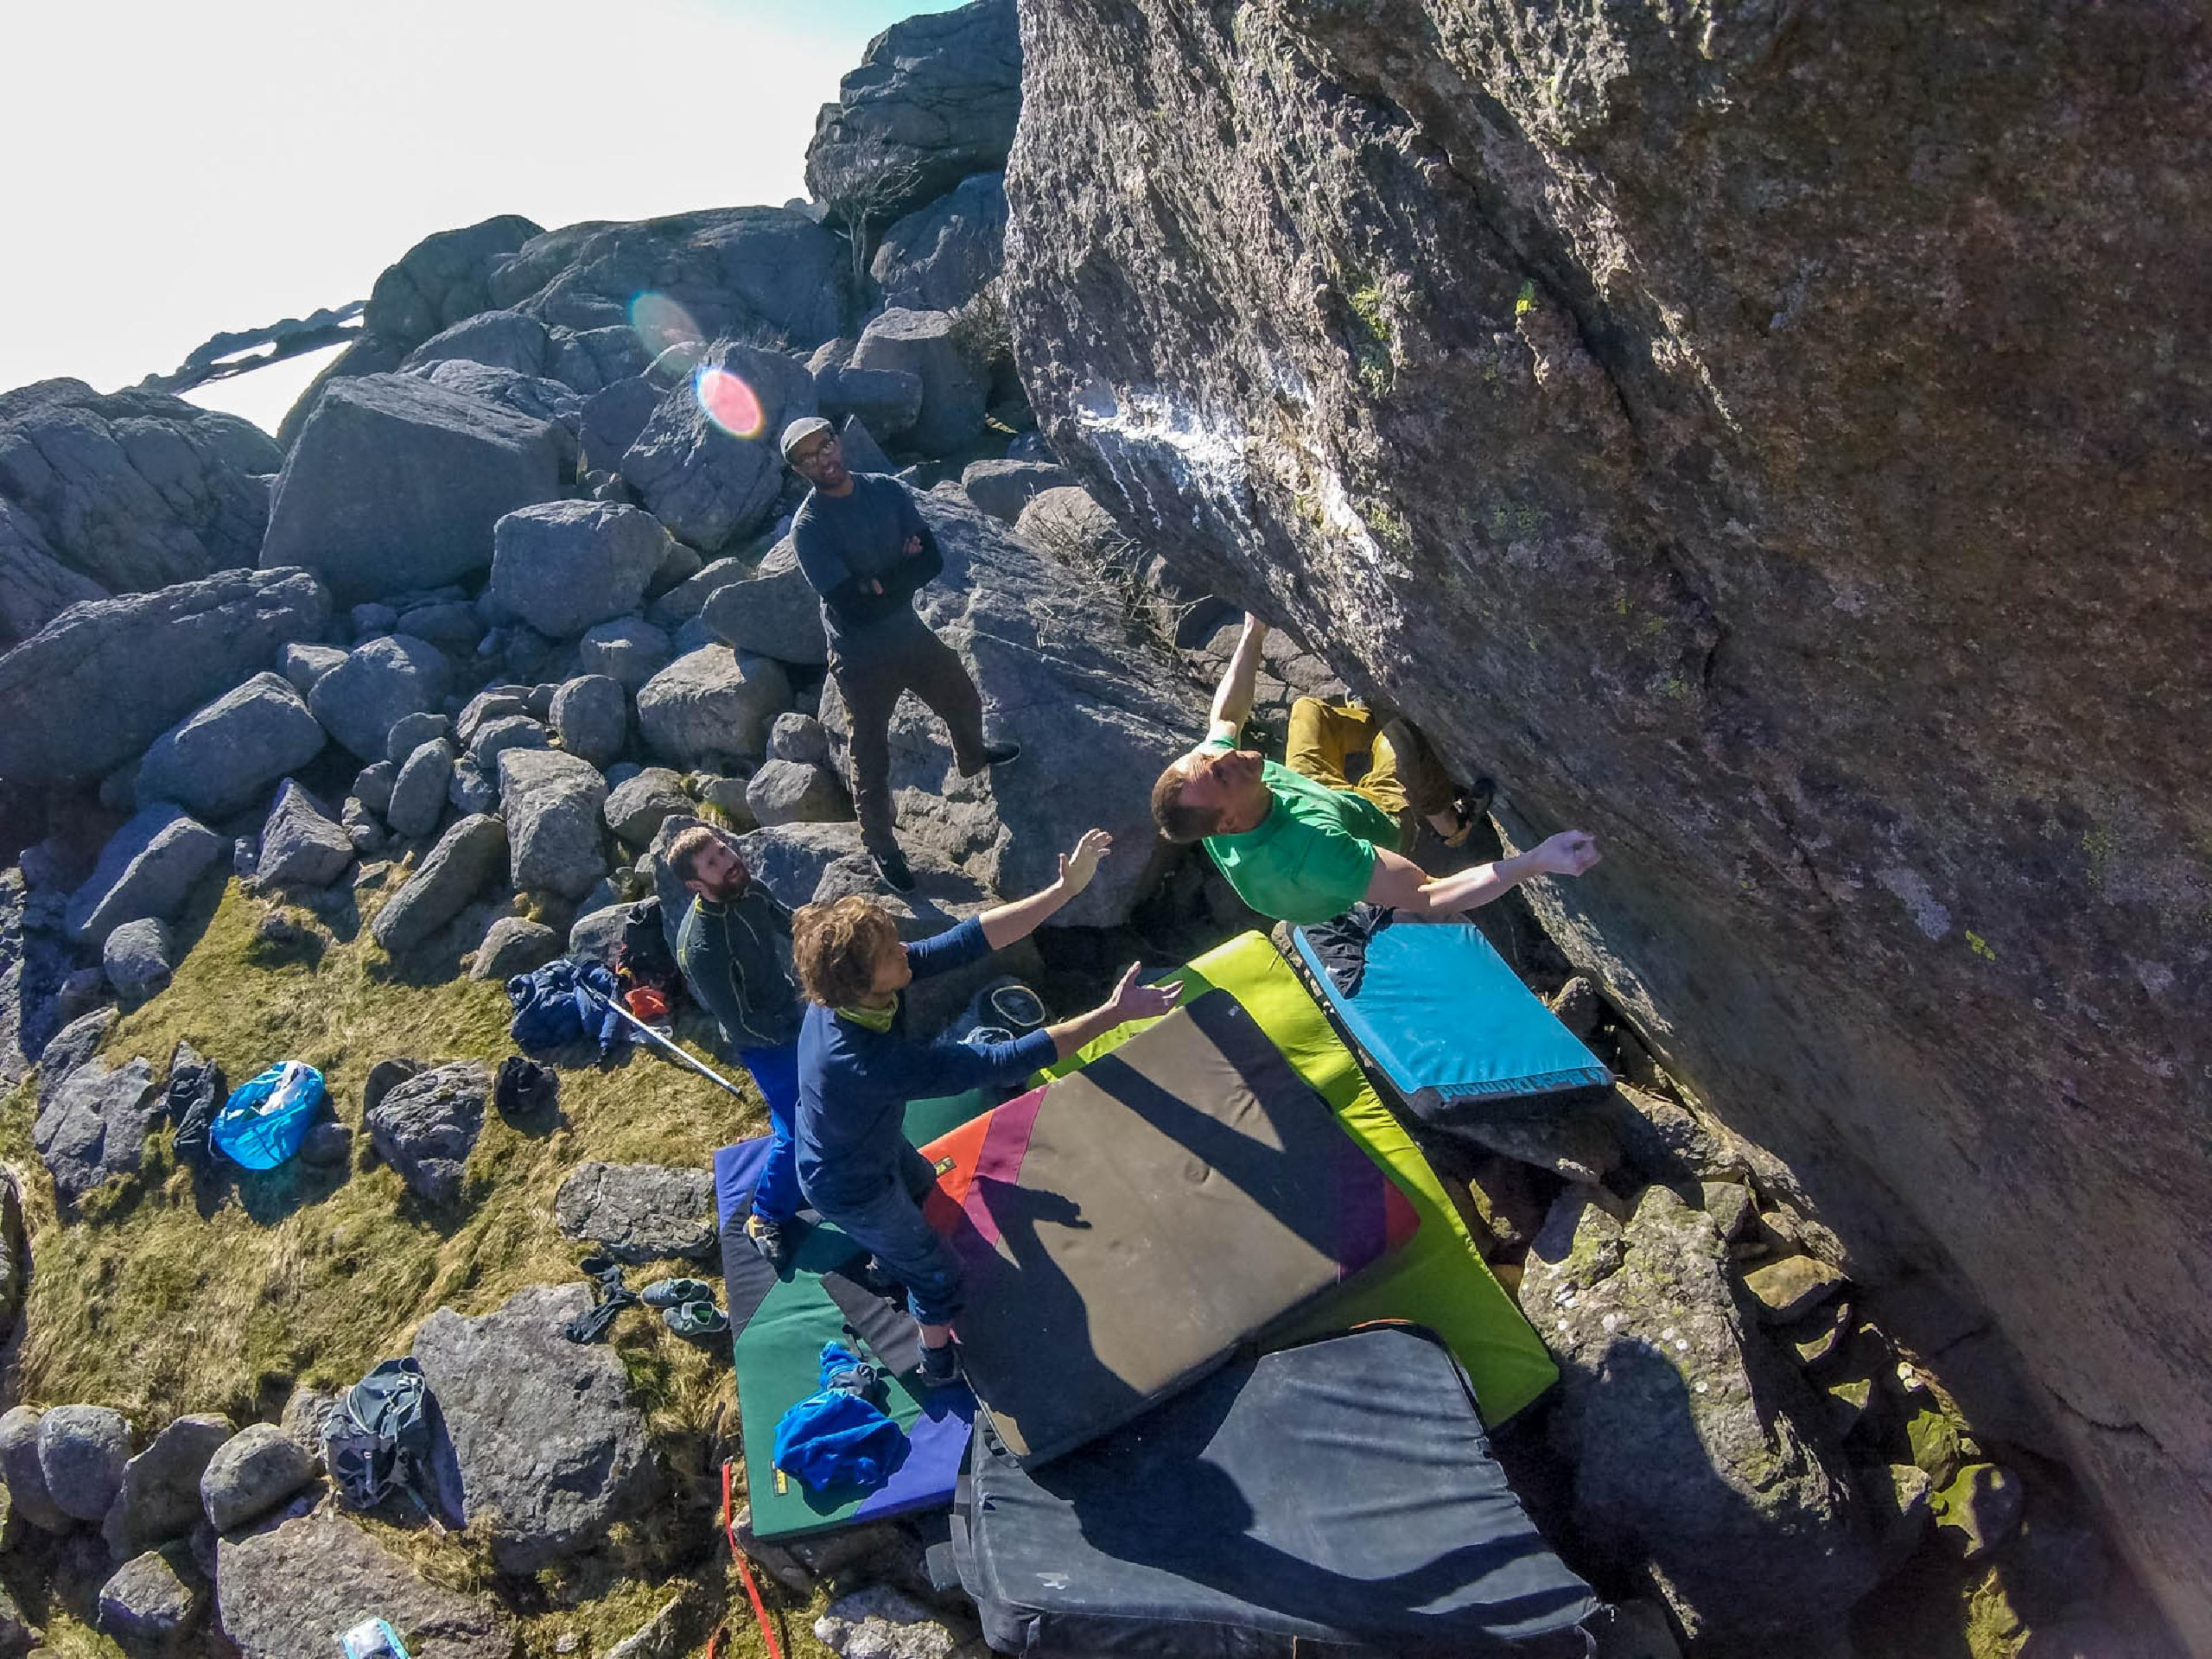 photographer: Jostein Øygarden, in photo: Jarle Risa